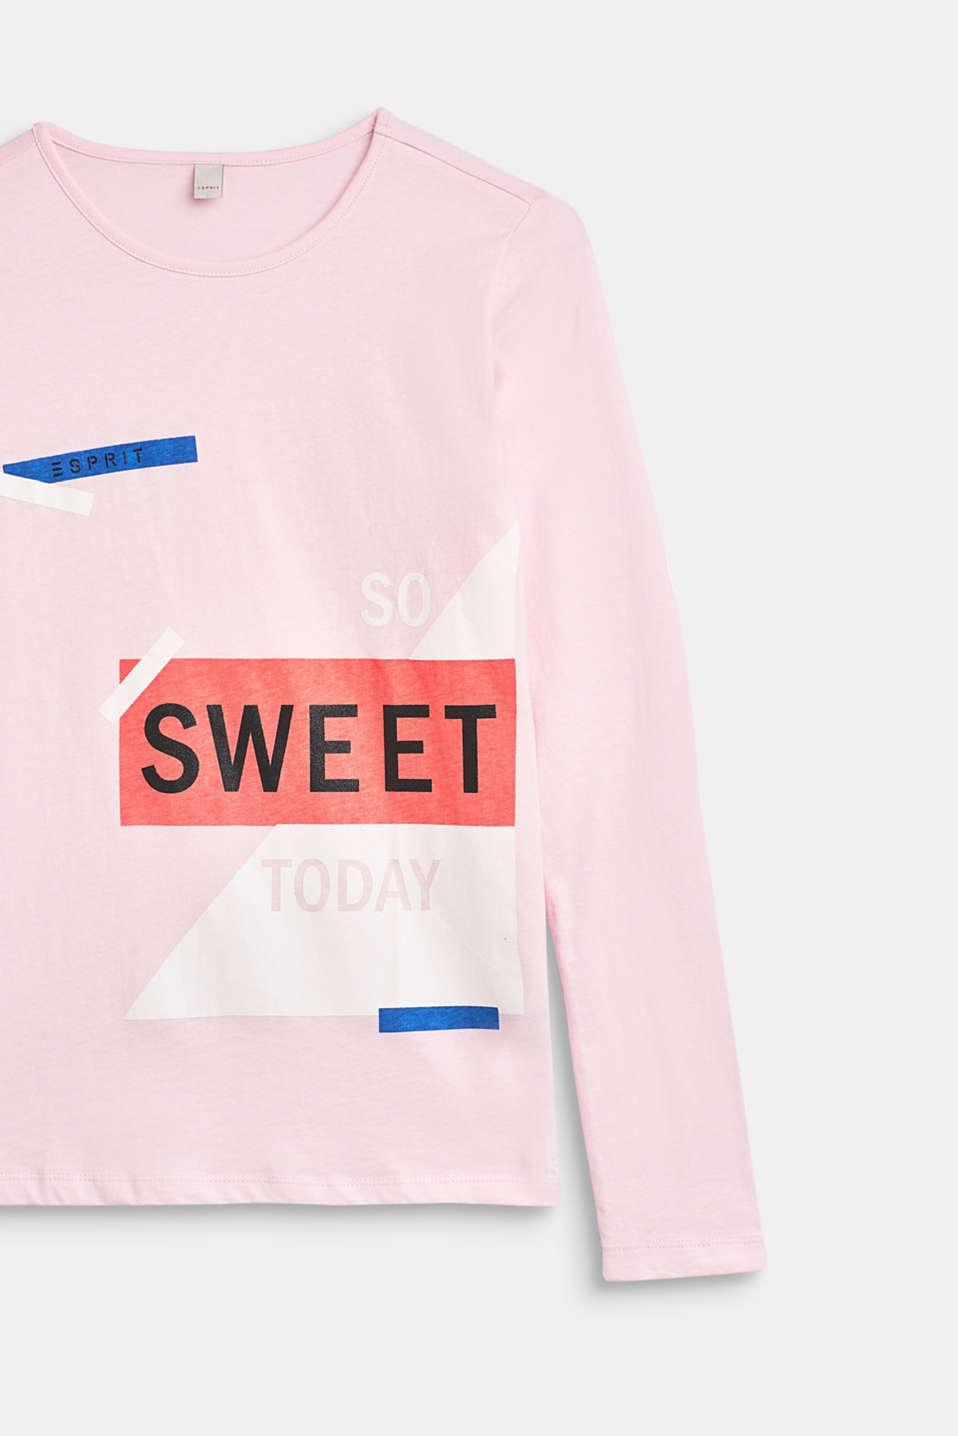 Statement print long sleeve top, 100% cotton, LCBLUSH, detail image number 2